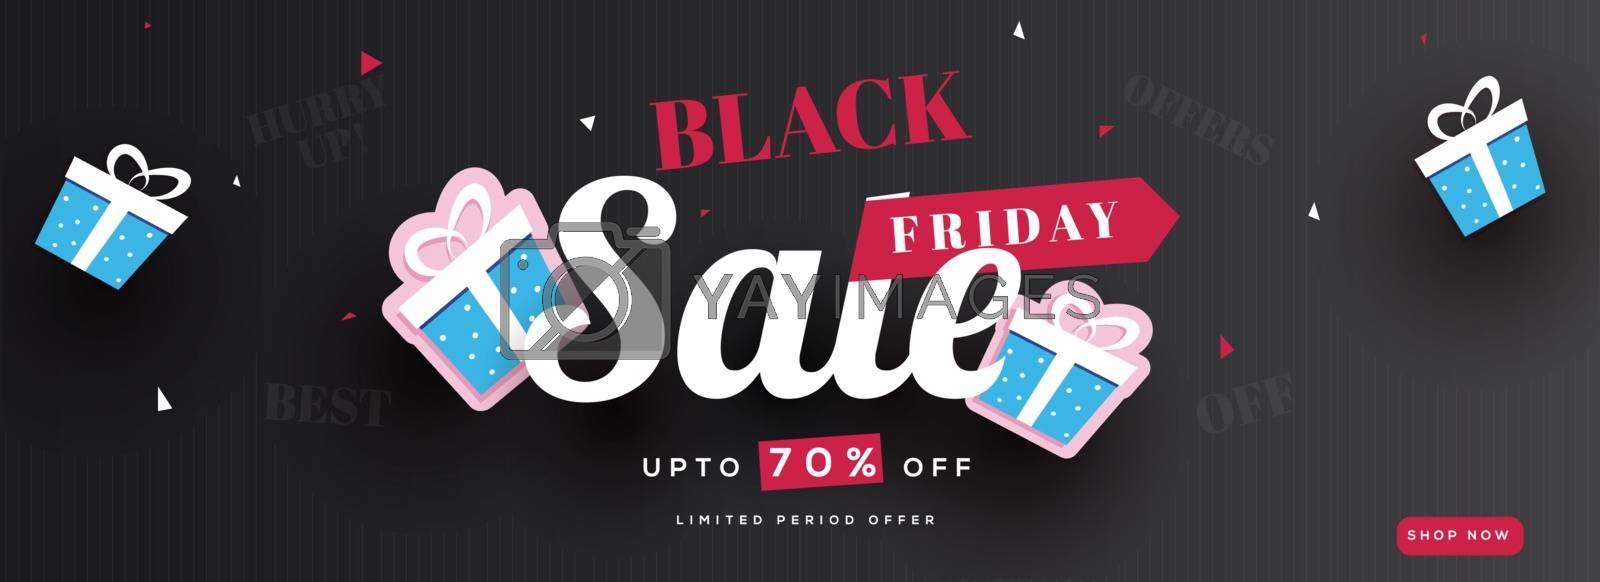 Black Friday Sale banner or header design, Upto 70% off offer with gift boxes on black background.